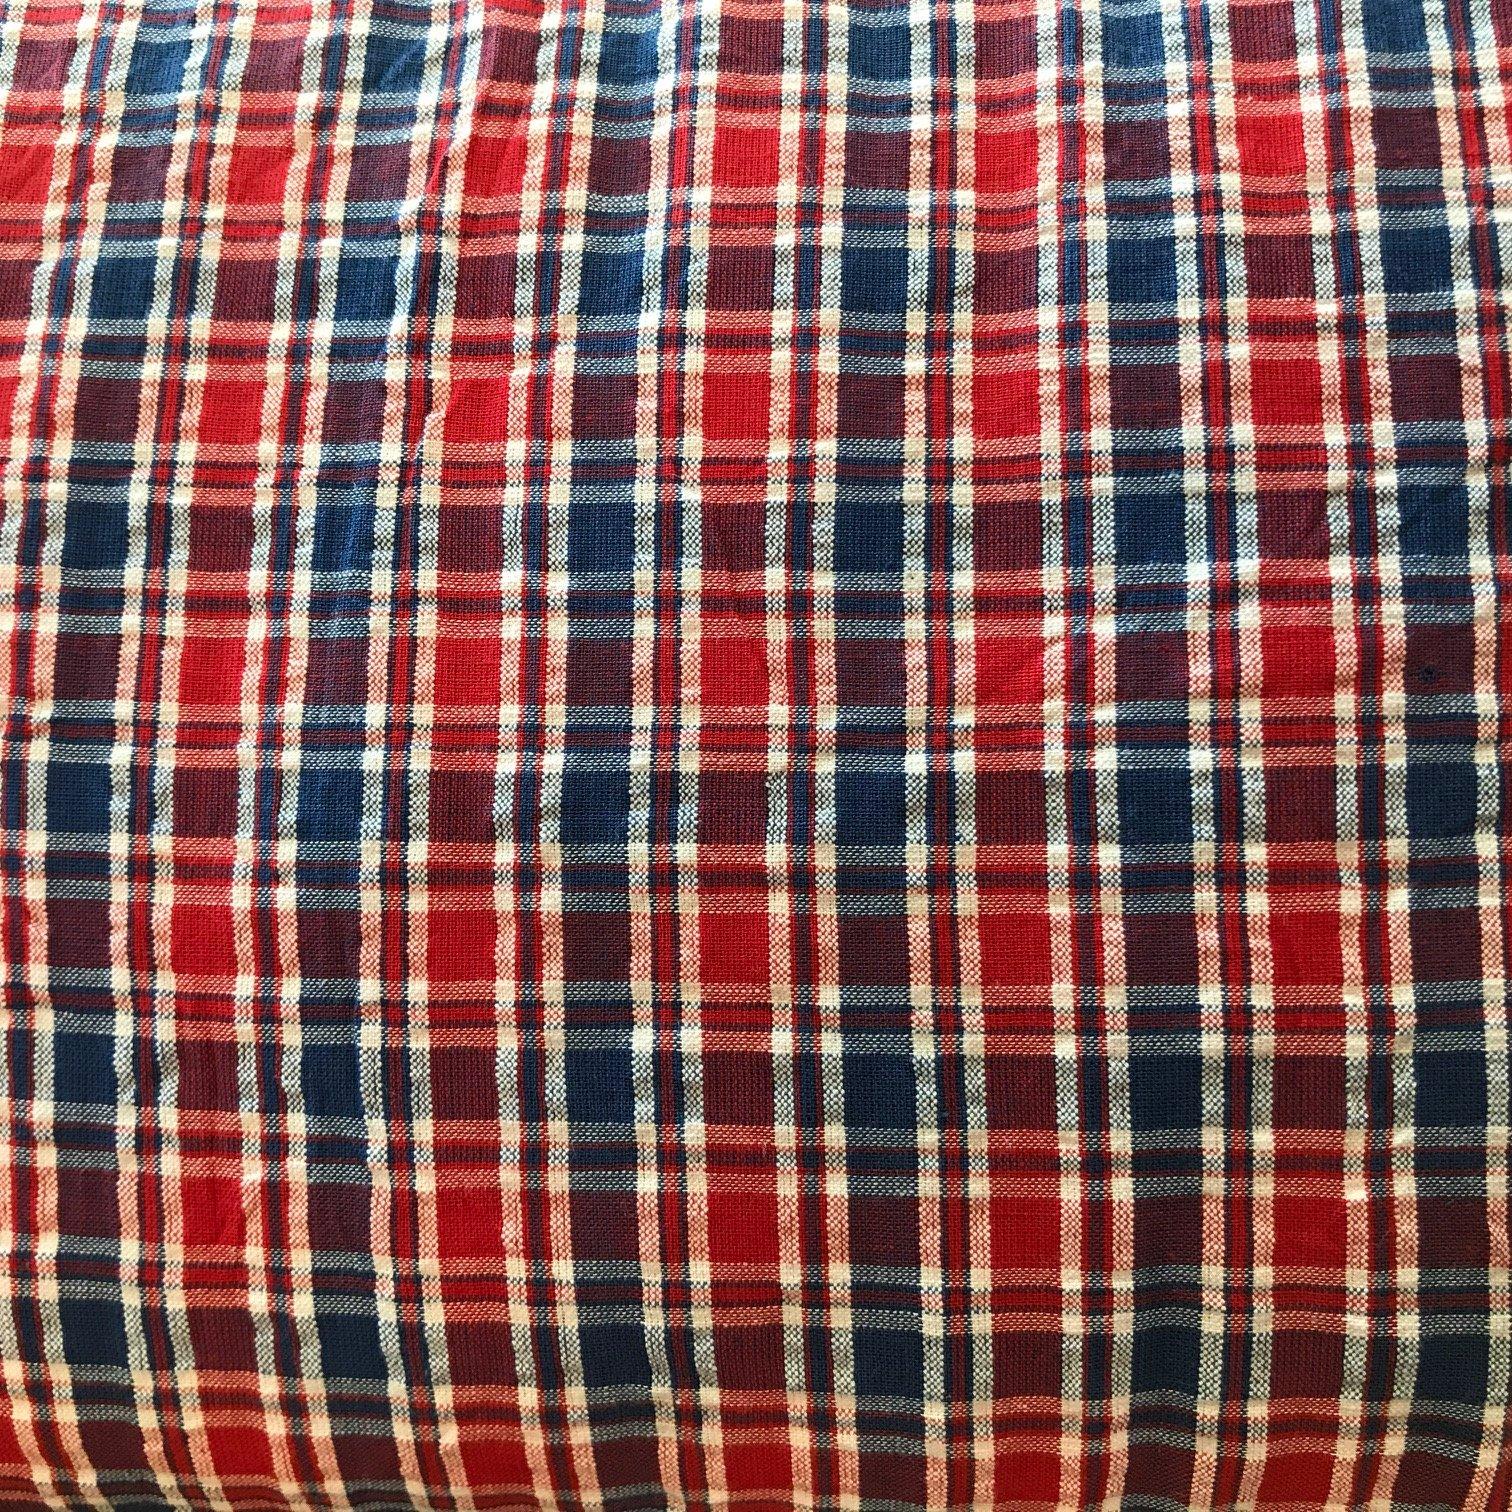 Blue and Red Plaid Seersucker 100% cotton 44 wide